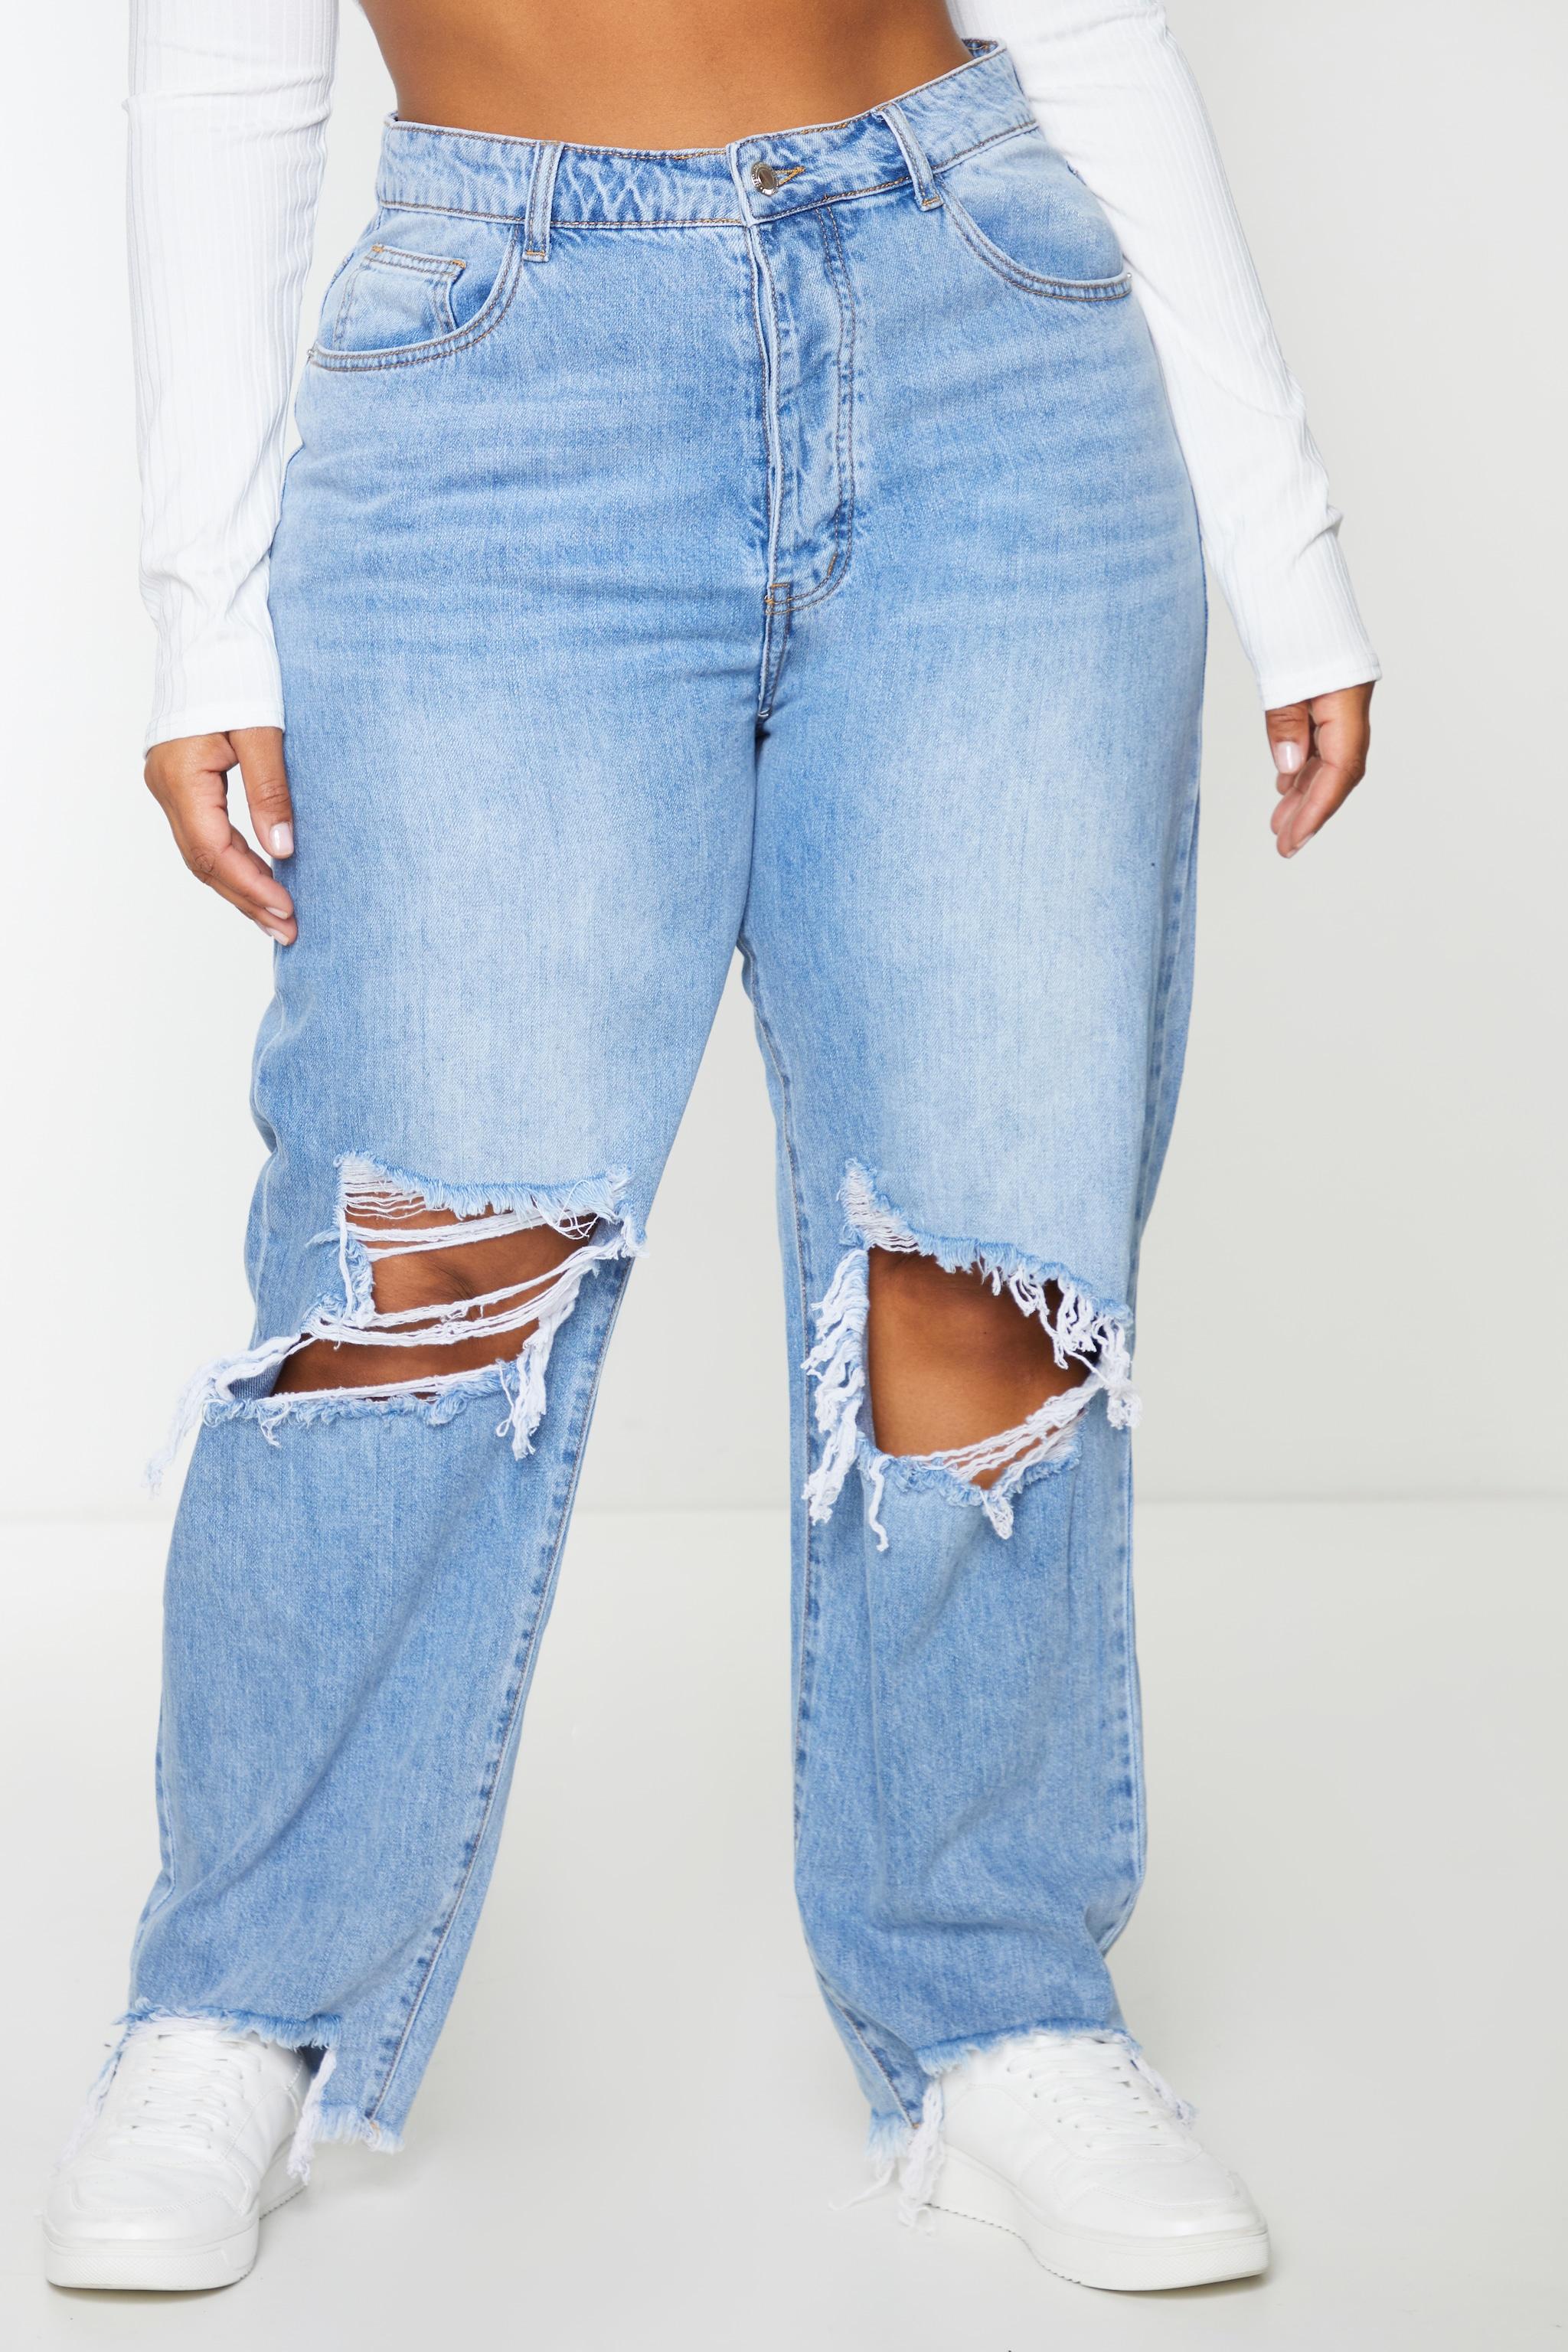 PRETTYLITTLETHING Plus Light Blue Wash Extreme Distressed Hem Boyfriend Jeans 2